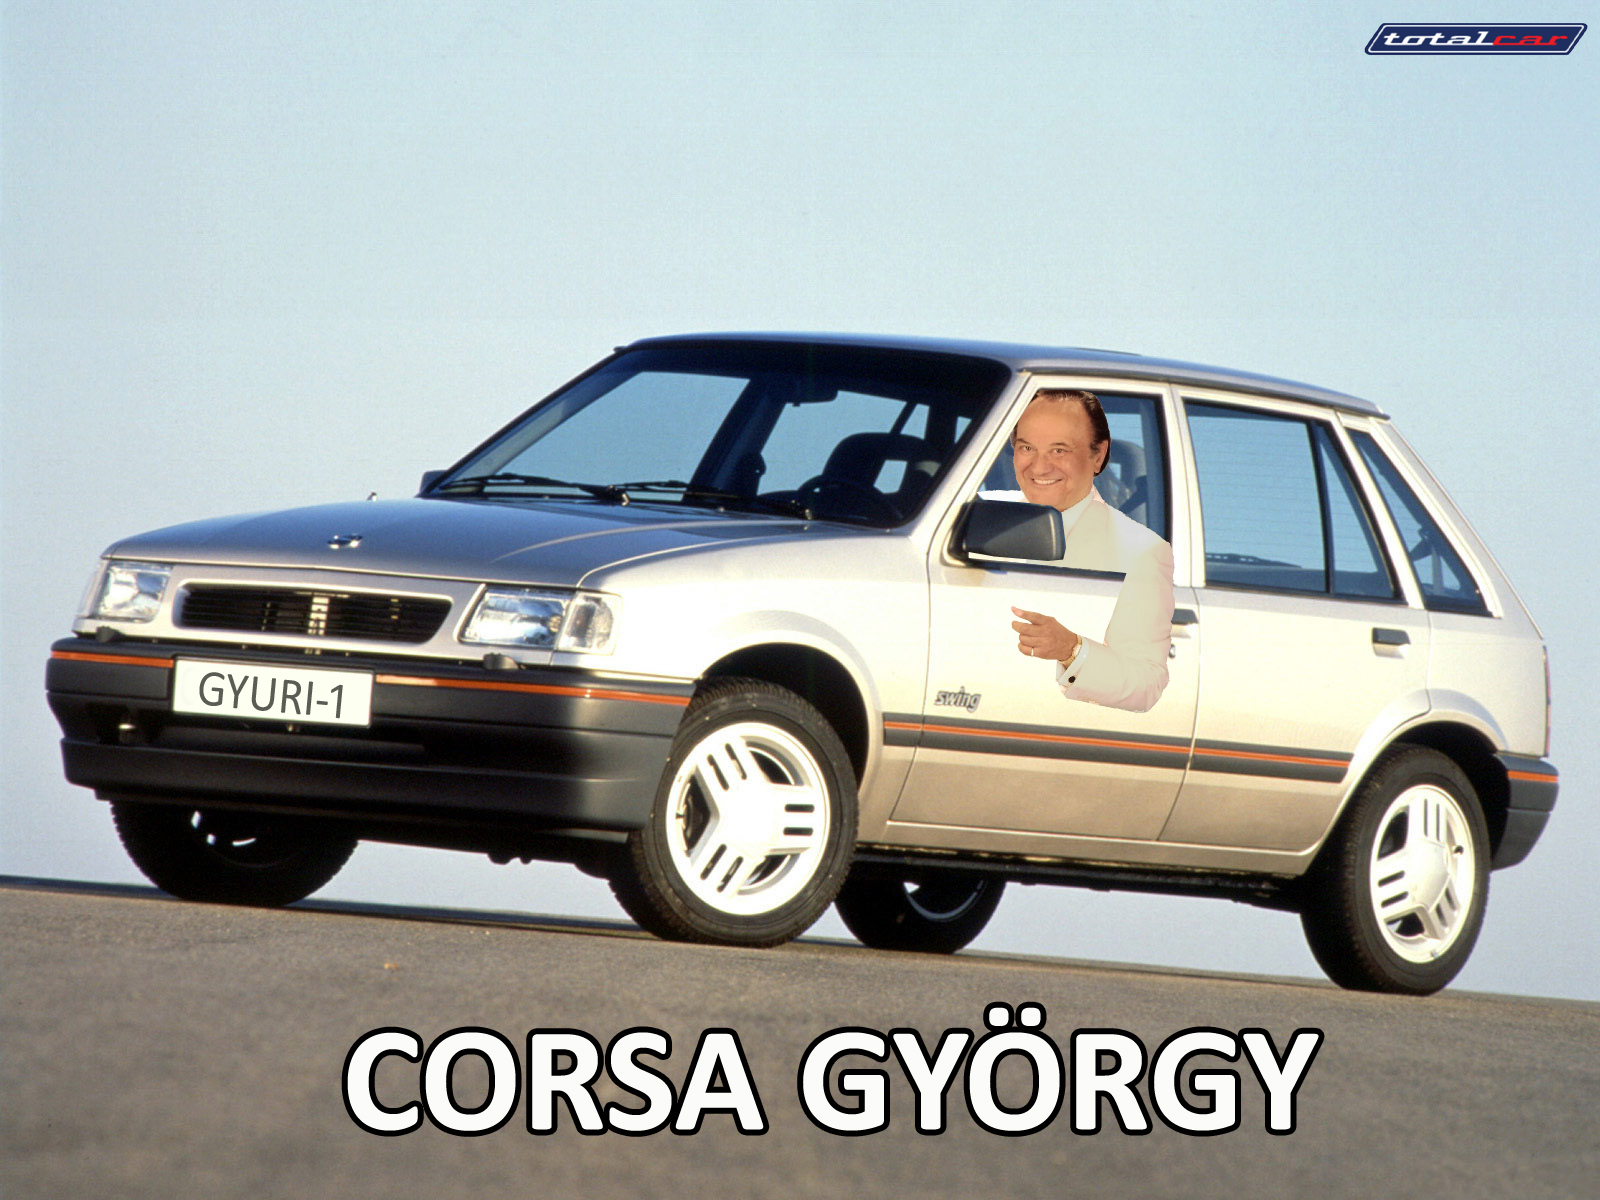 corsa_gyorgy.jpg